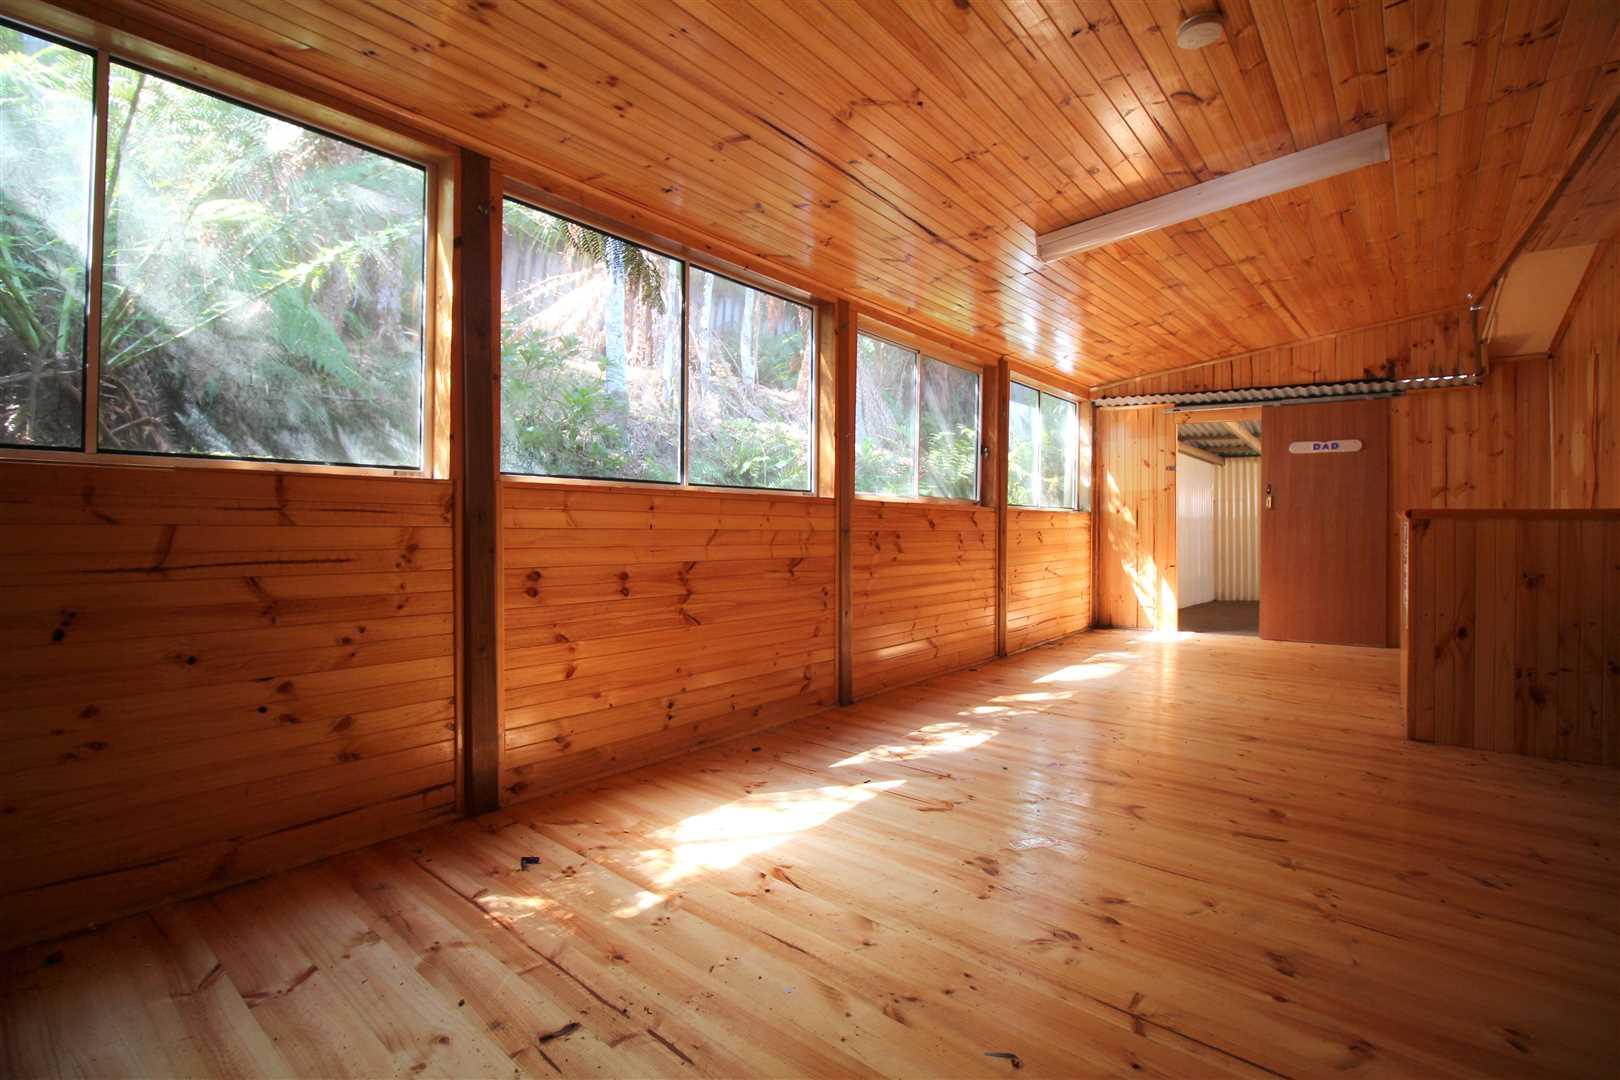 Rumpus Room or Potential Third Bedroom